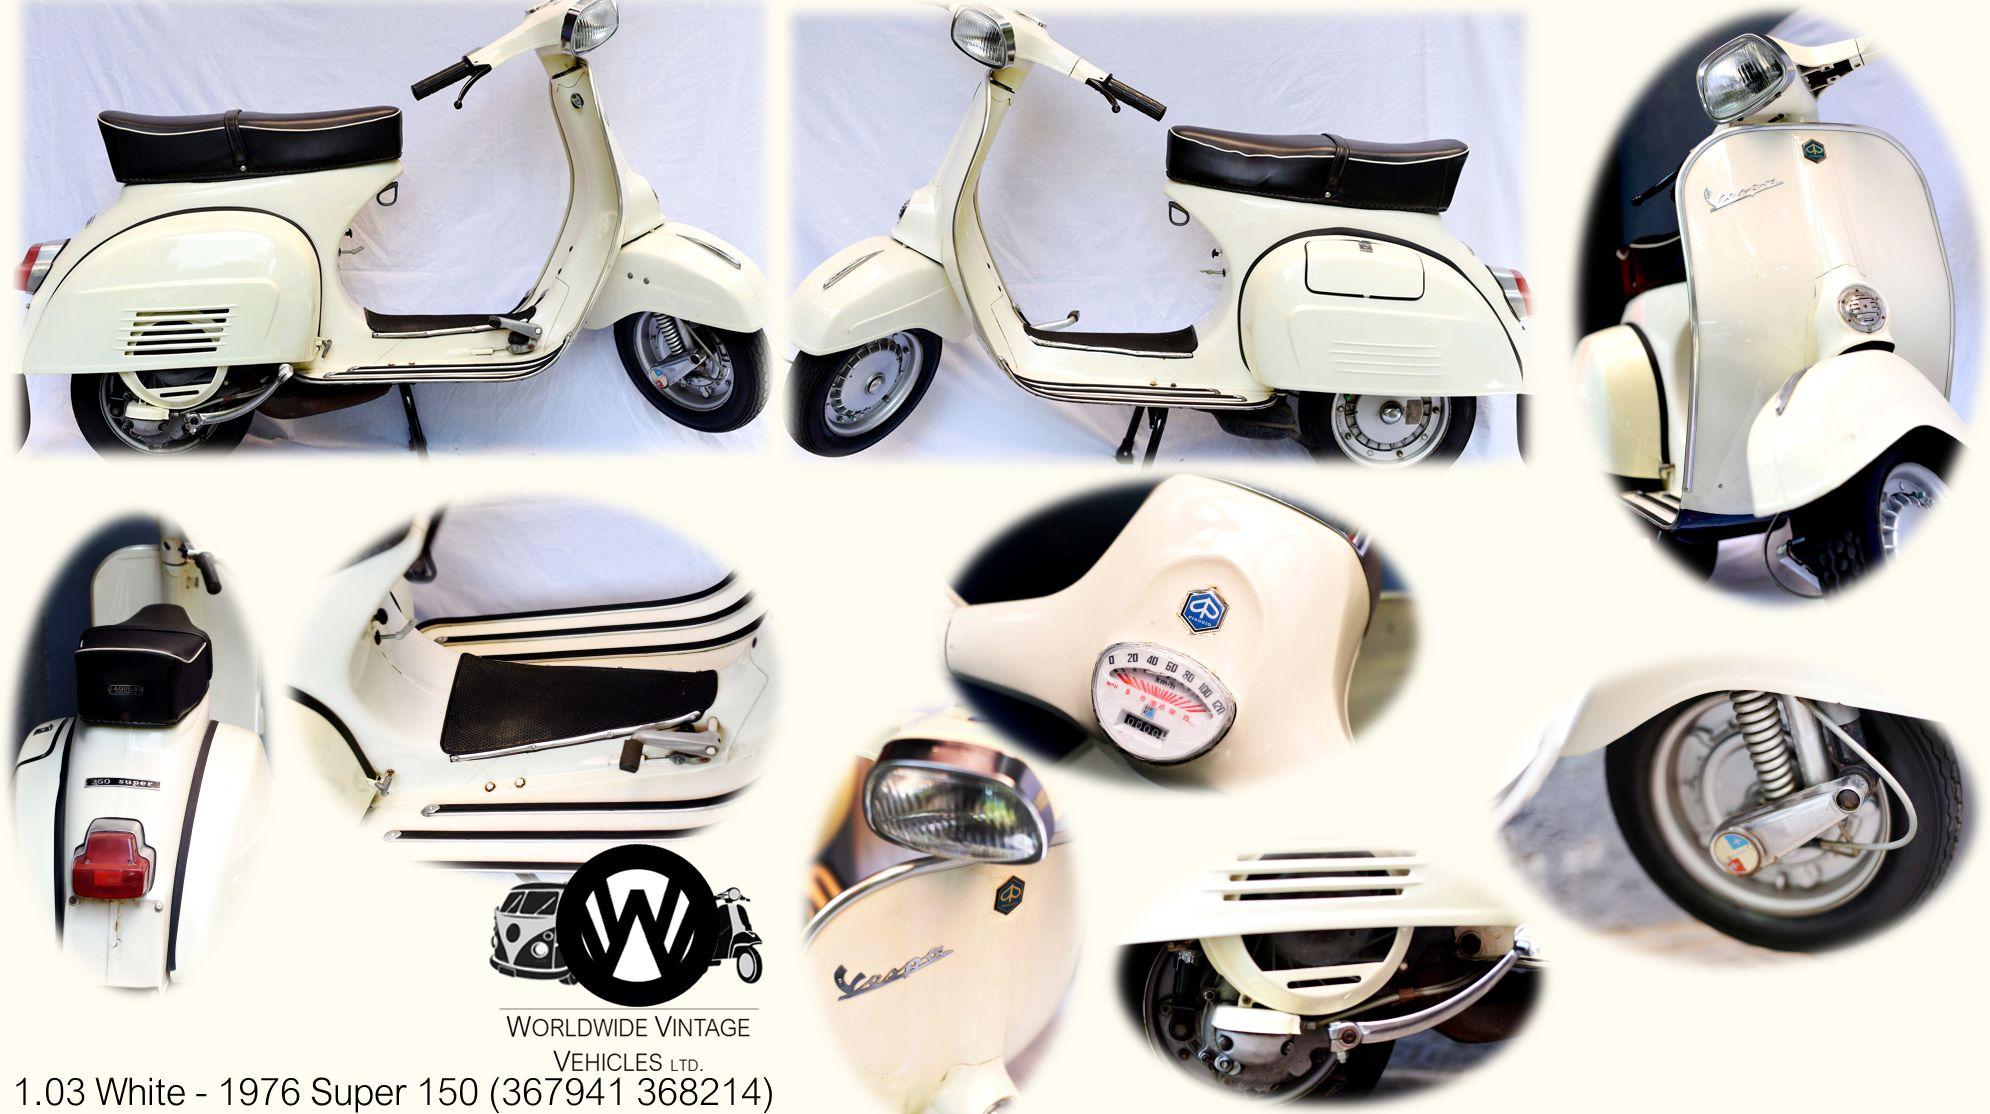 3 1976 White Vespa Super 150 Worldwide Vintage Vehicles